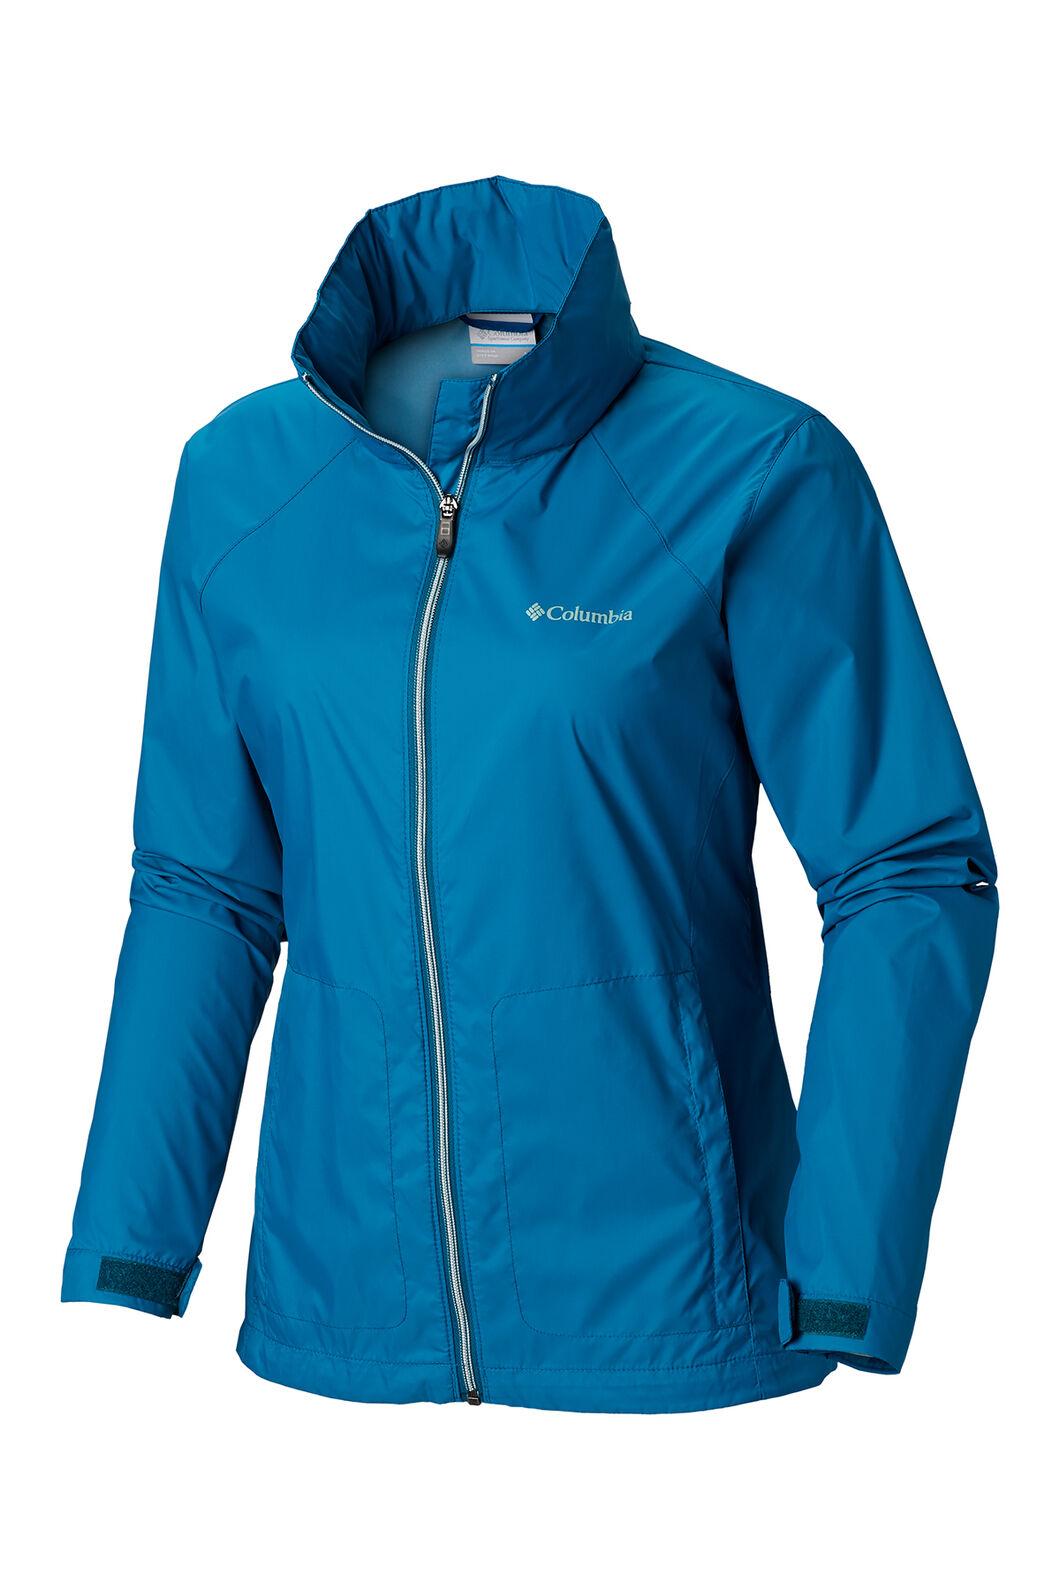 Columbia Switchback III Rain Jacket - Women's, Siberia, hi-res